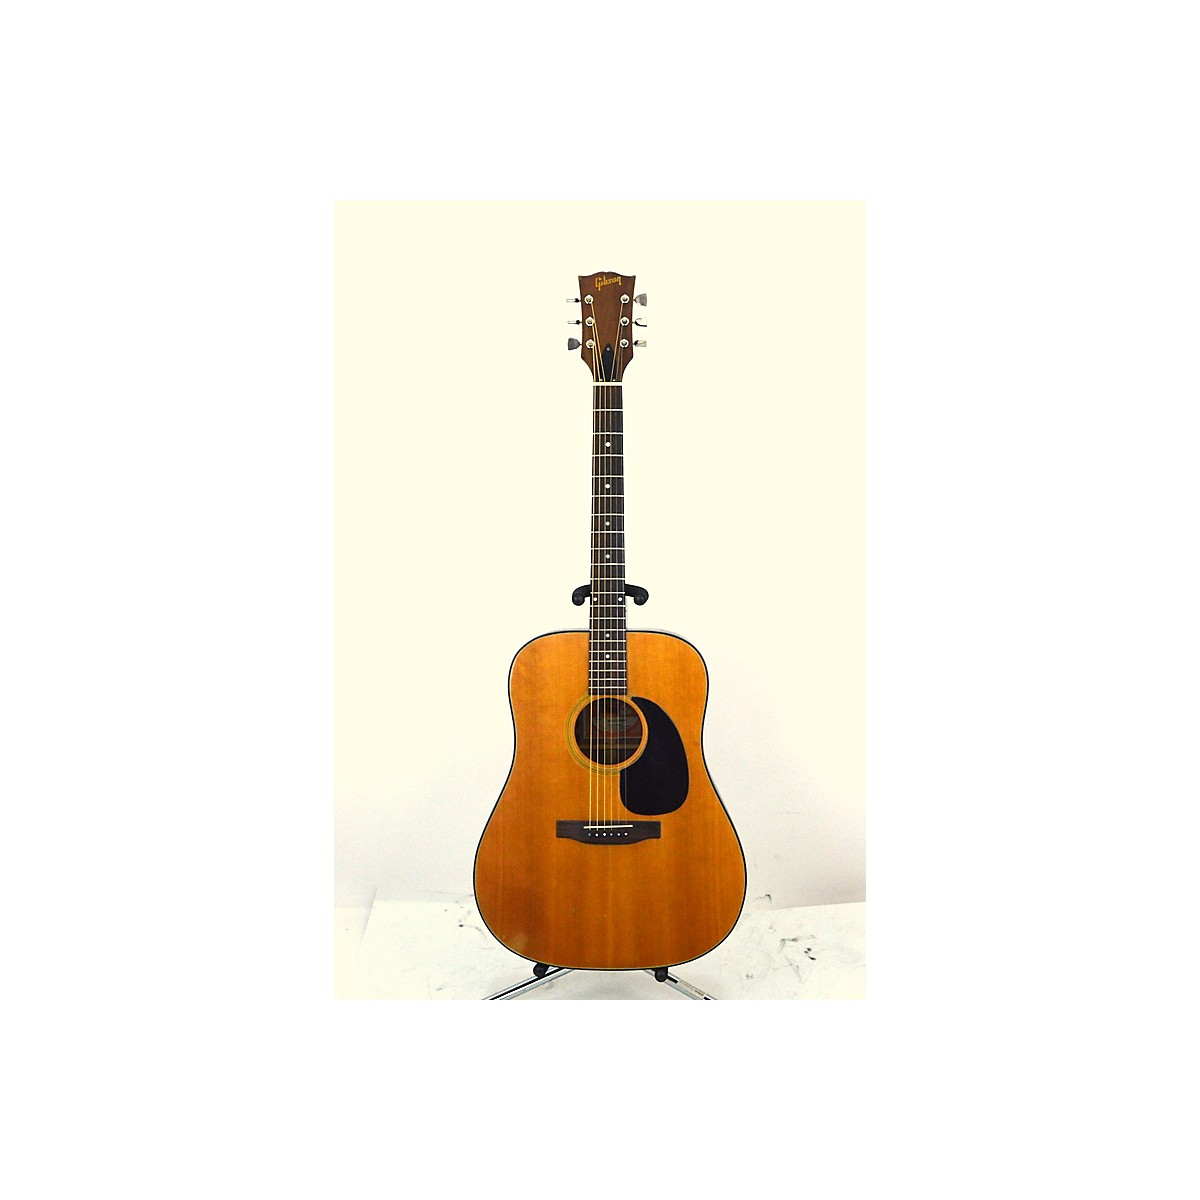 Gibson 1970s Blue Ridge Acoustic Guitar